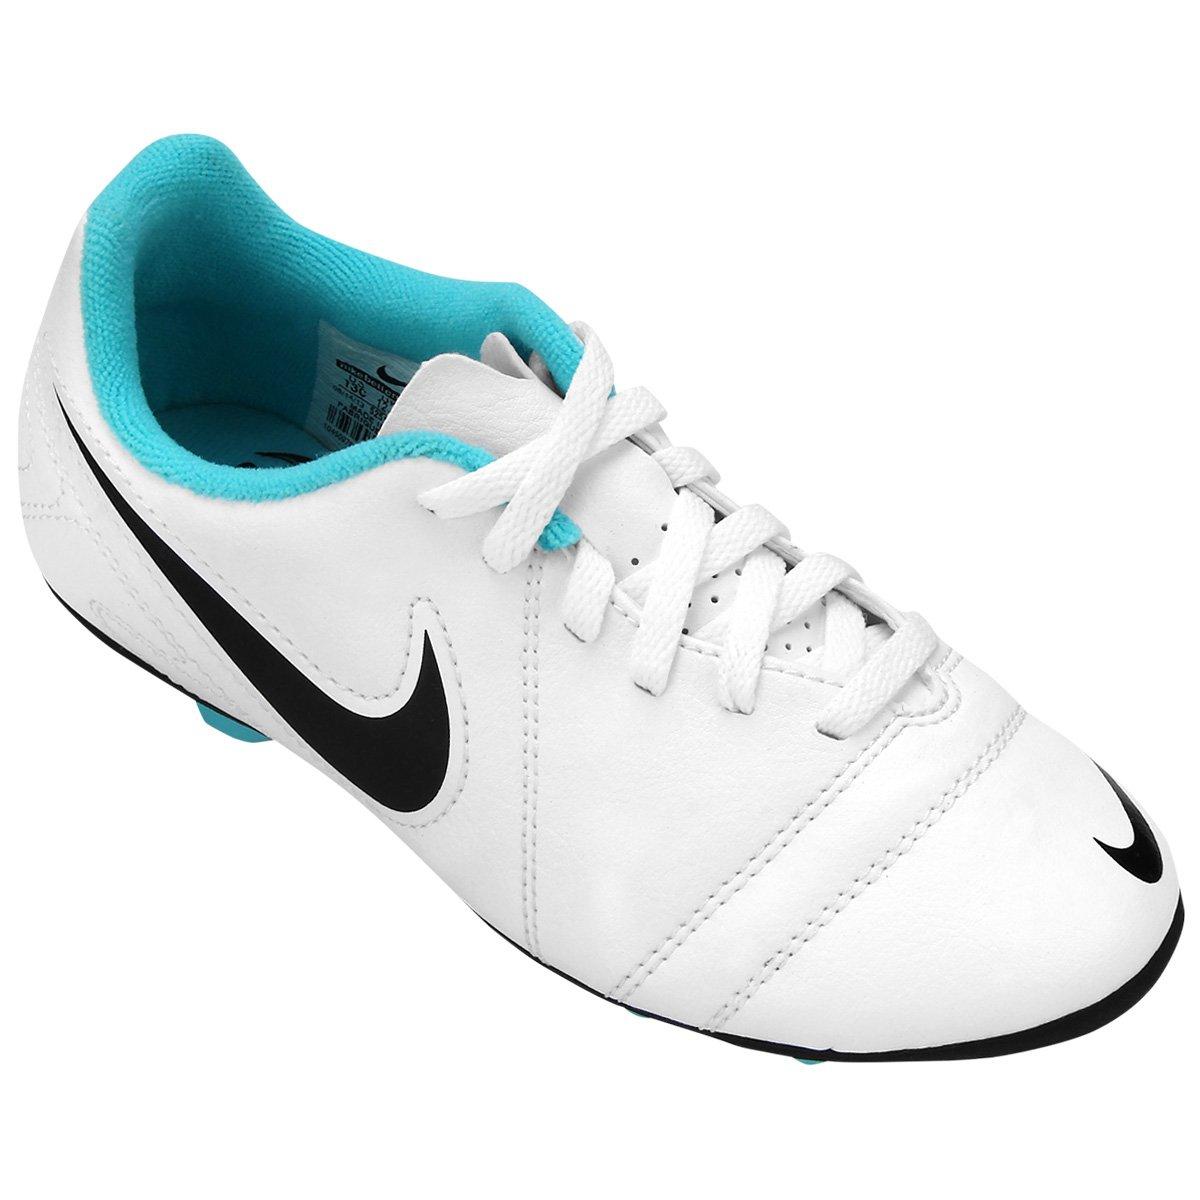 be306a1cc7 Chuteira Nike CTR360 Enganche 3 FG-R Infantil - Compre Agora